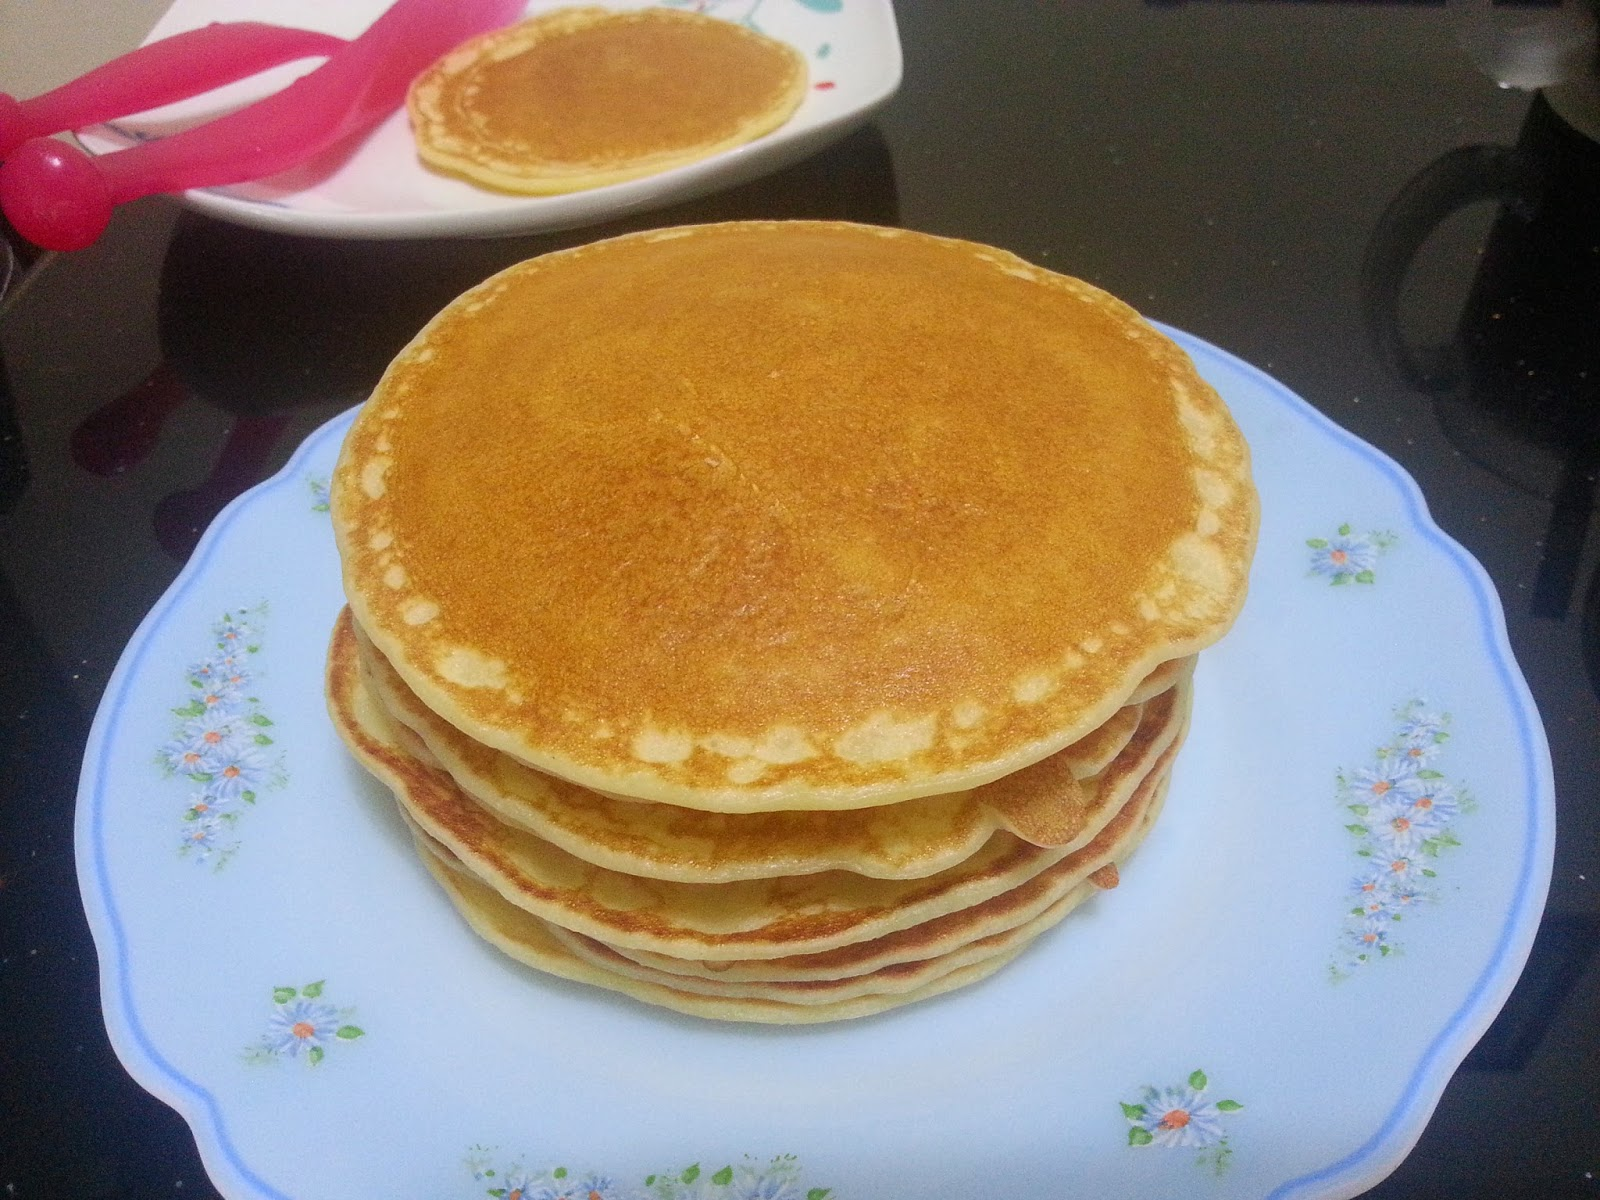 kamu resepi pancake mudah  sedap Resepi Urap Turi Enak dan Mudah